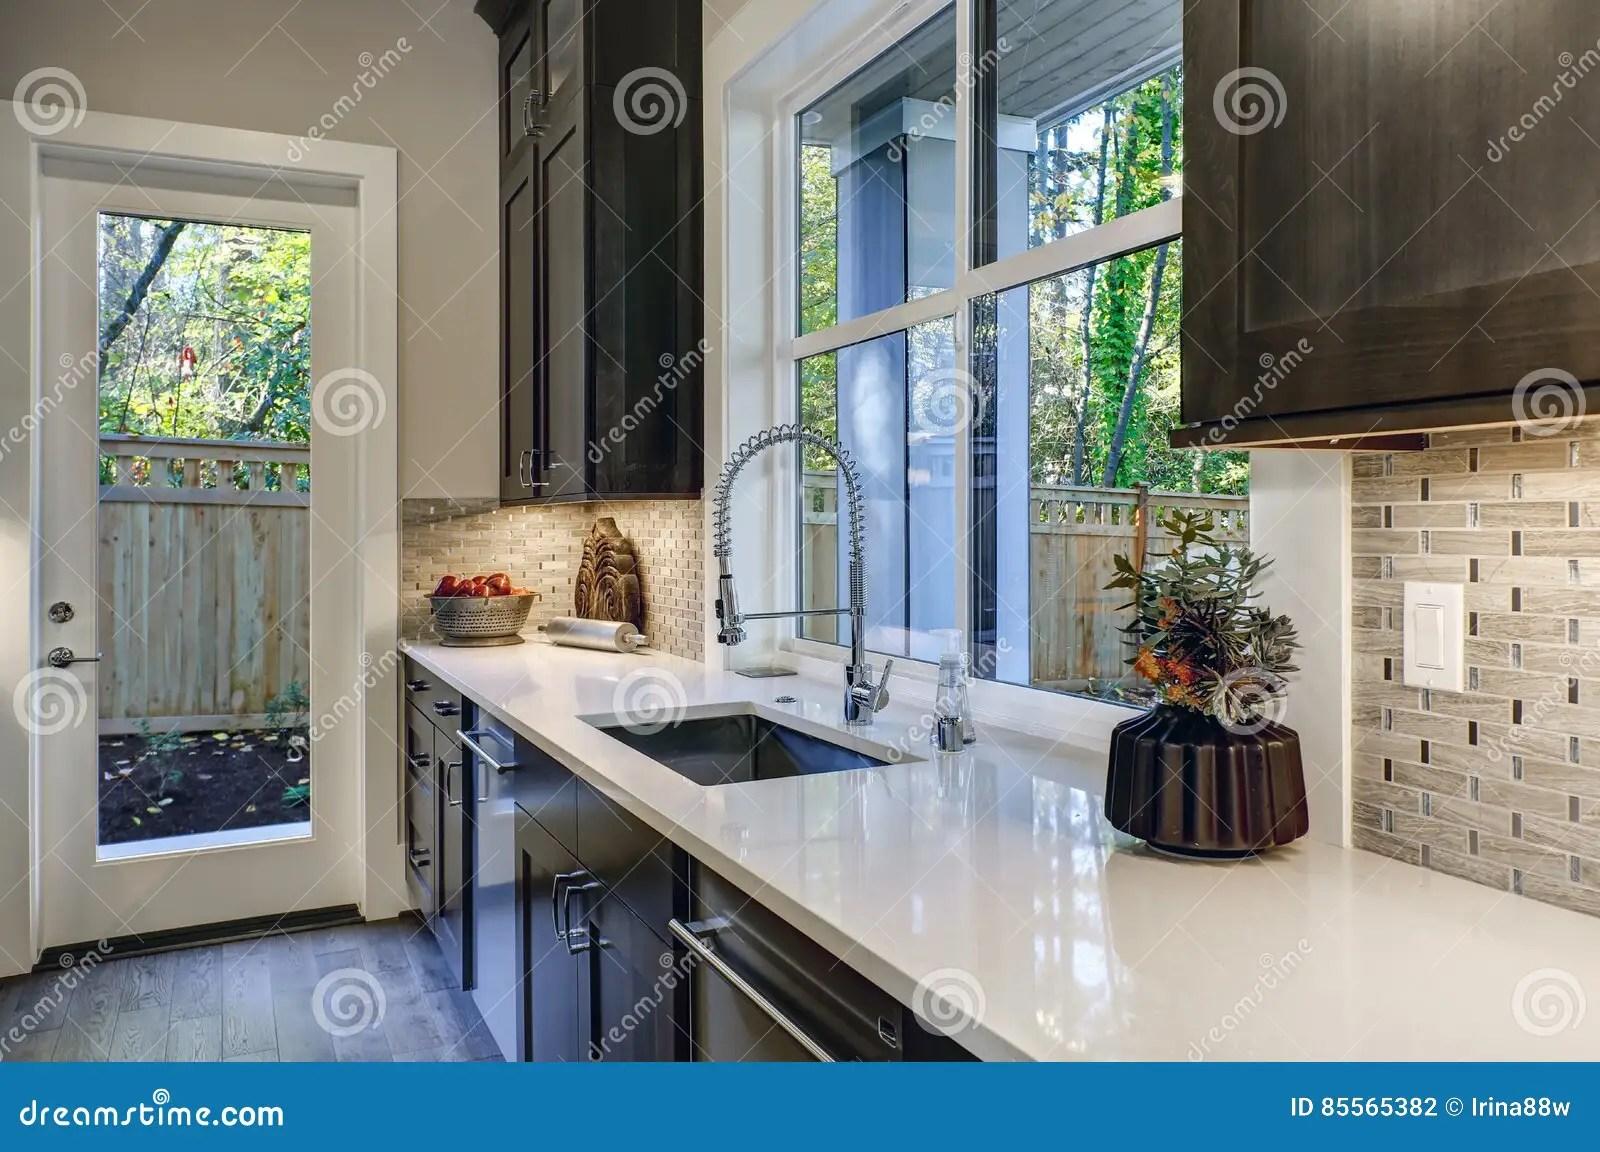 brown kitchen sink summer kitchens 与棕色厨柜的当代厨房设计库存照片 图片包括有发光 厨房 视窗 西北 与棕色厨柜的当代厨房设计